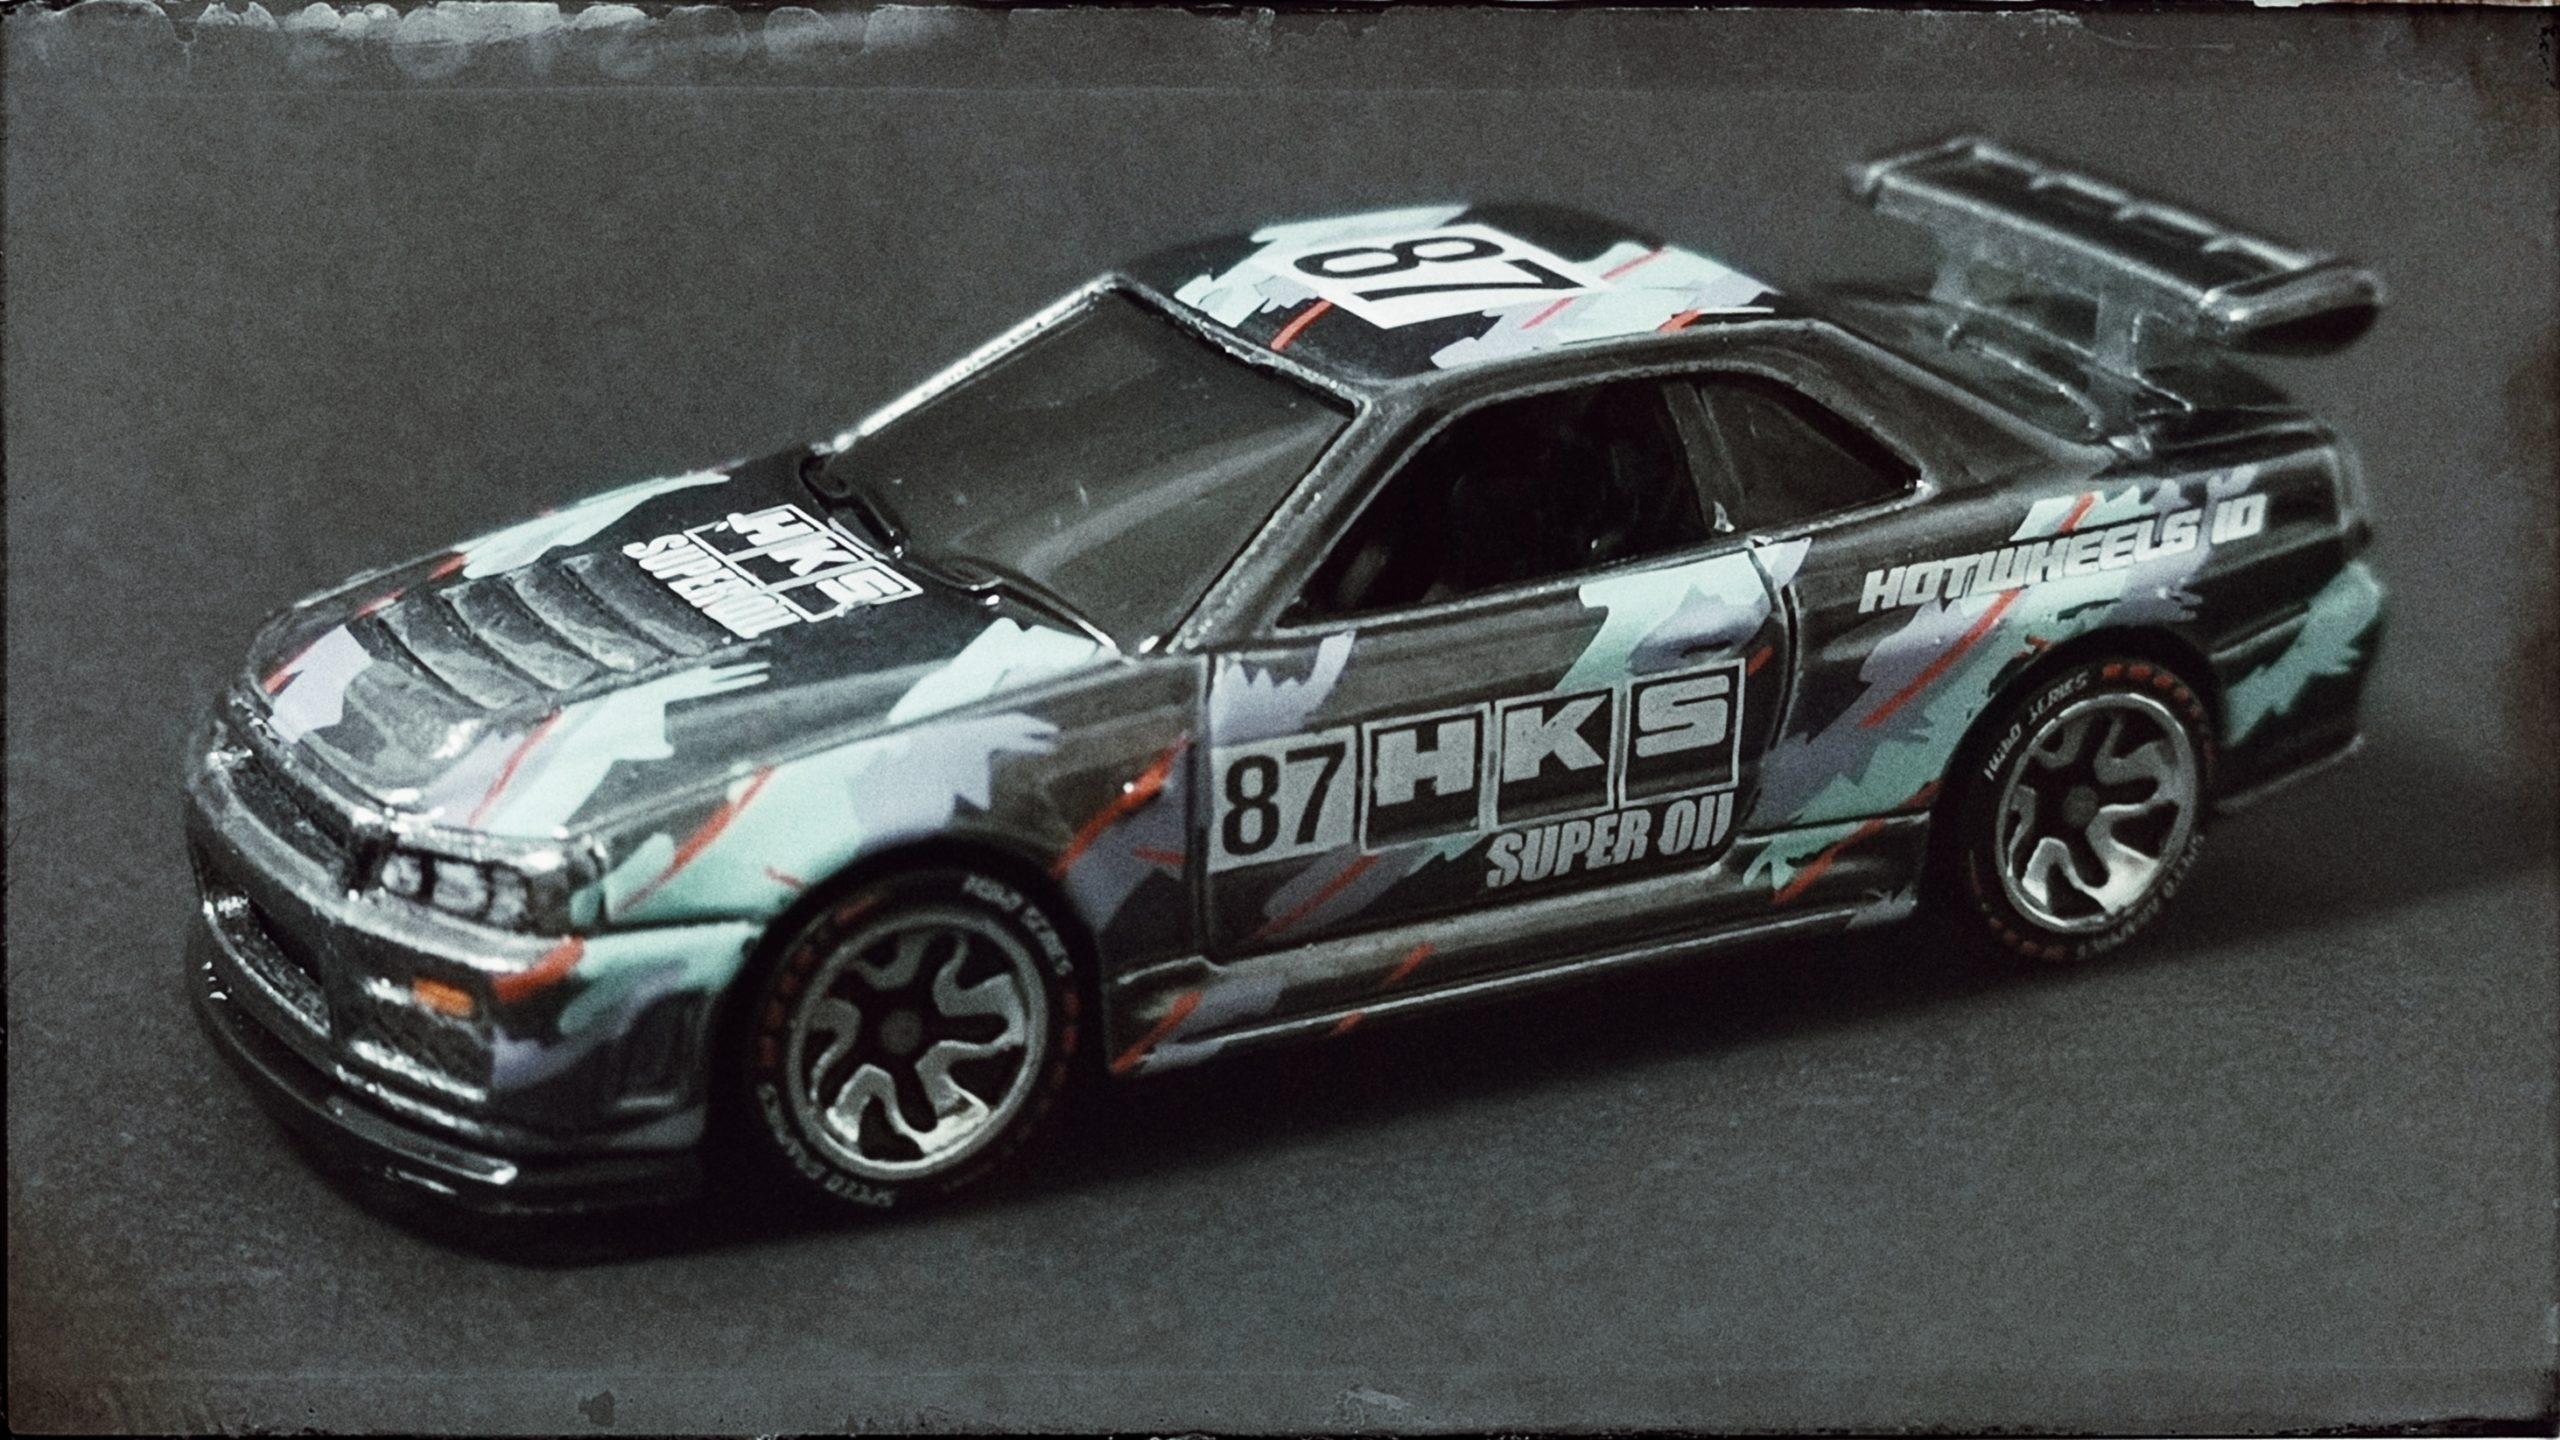 Hot Wheels id Nissan Skyline GT-R (R34) (HBG07) 2021 HW Speed Graphics (03/04) spectraflame black side angle